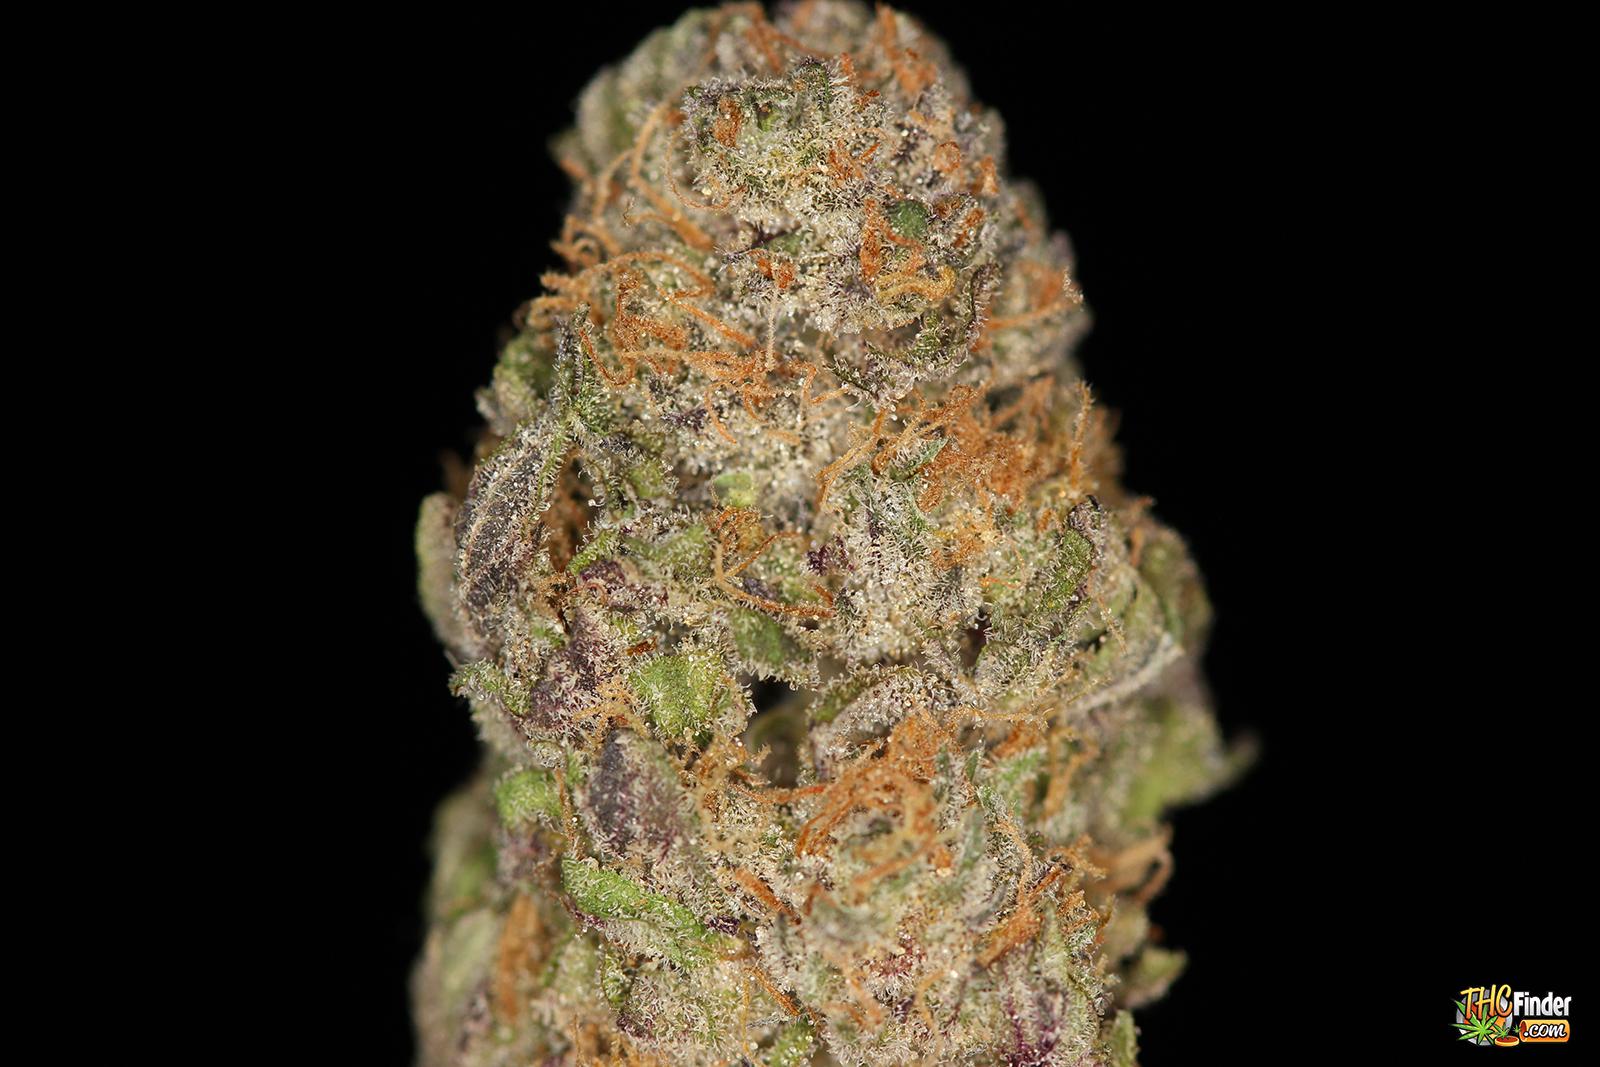 pz-purple-zombie-weed